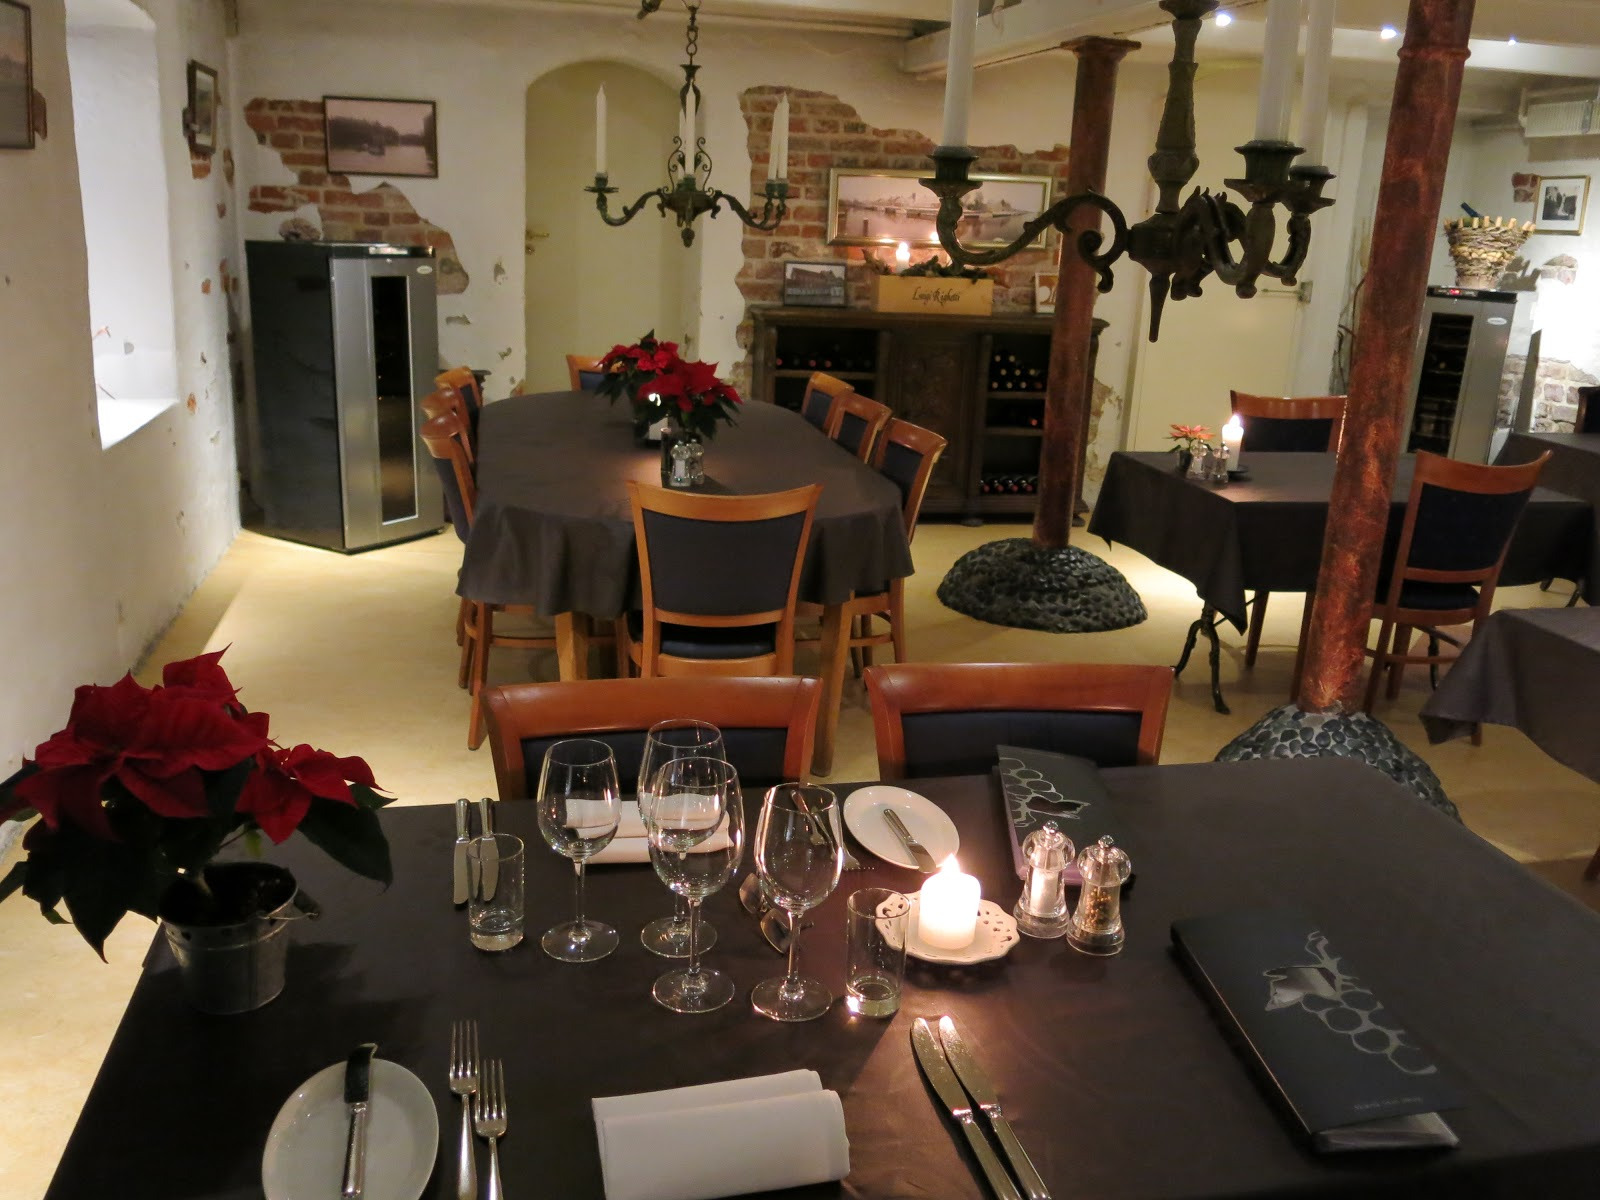 Restaurace Kolvig má dokonalou atmosféru.